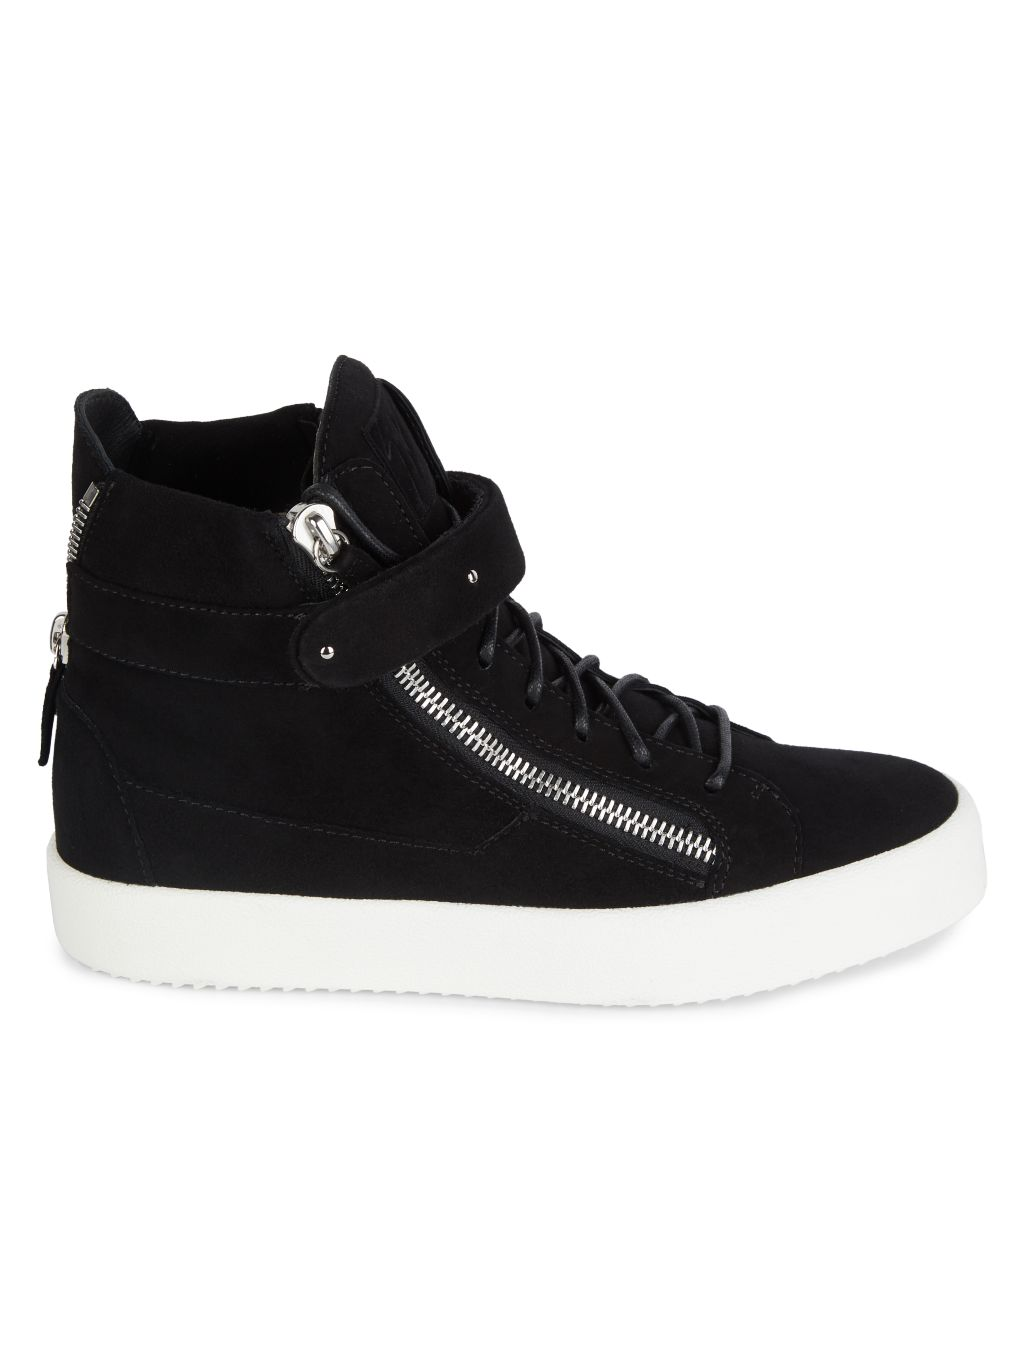 Giuseppe Zanotti High-Top Zip & Strap Leather Sneakers